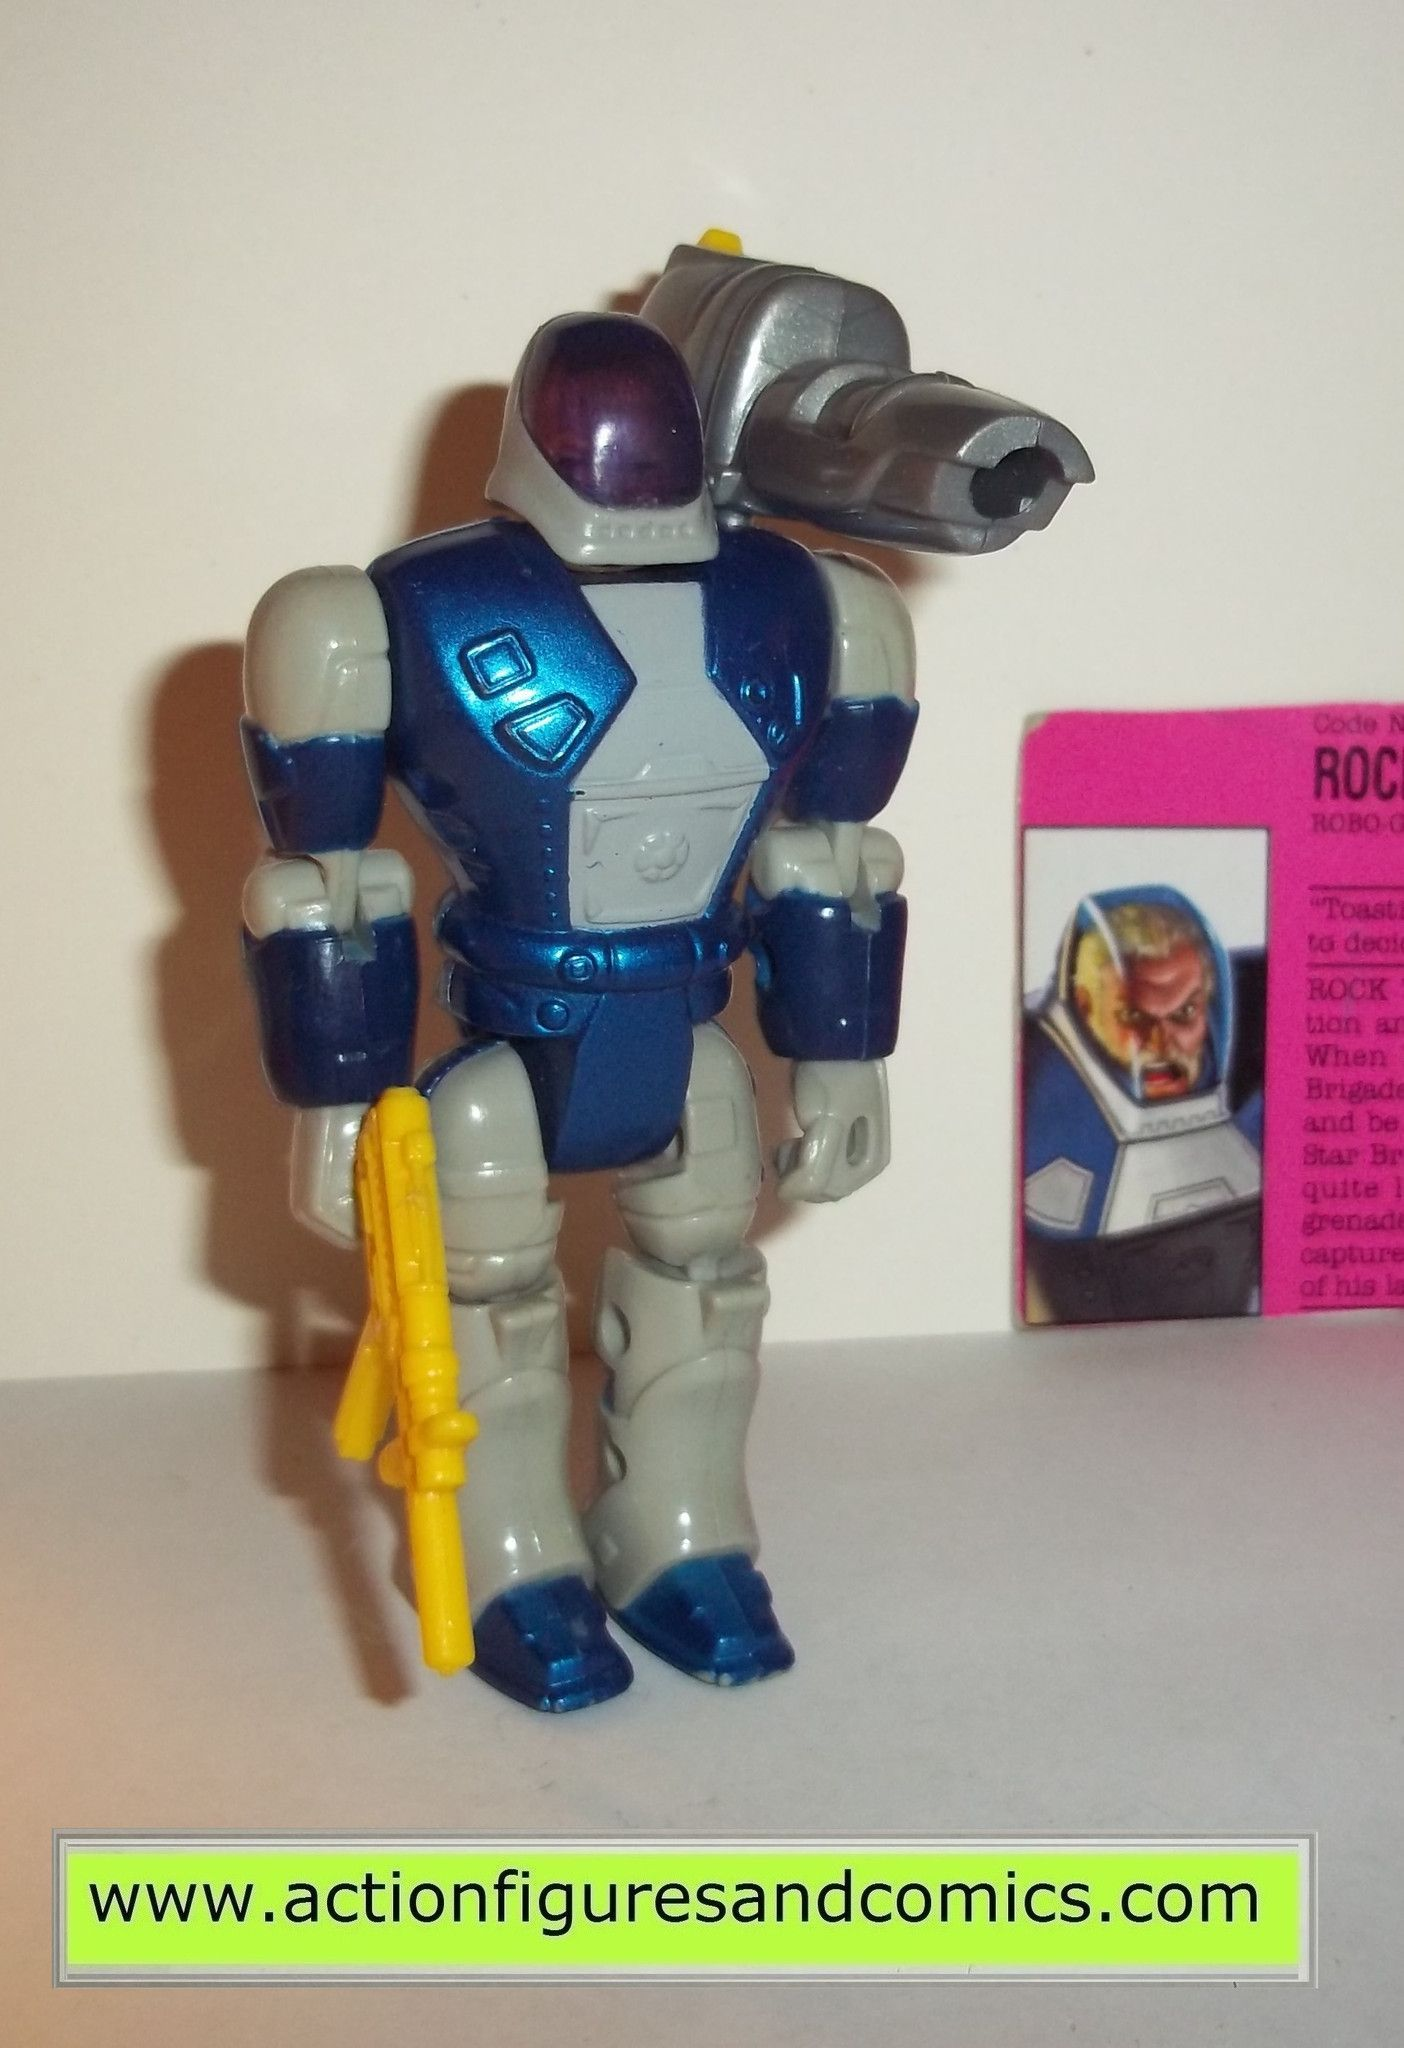 GI Joe Weapon ROBO JOE Missile Launcher 1993 Original Figure Accessory